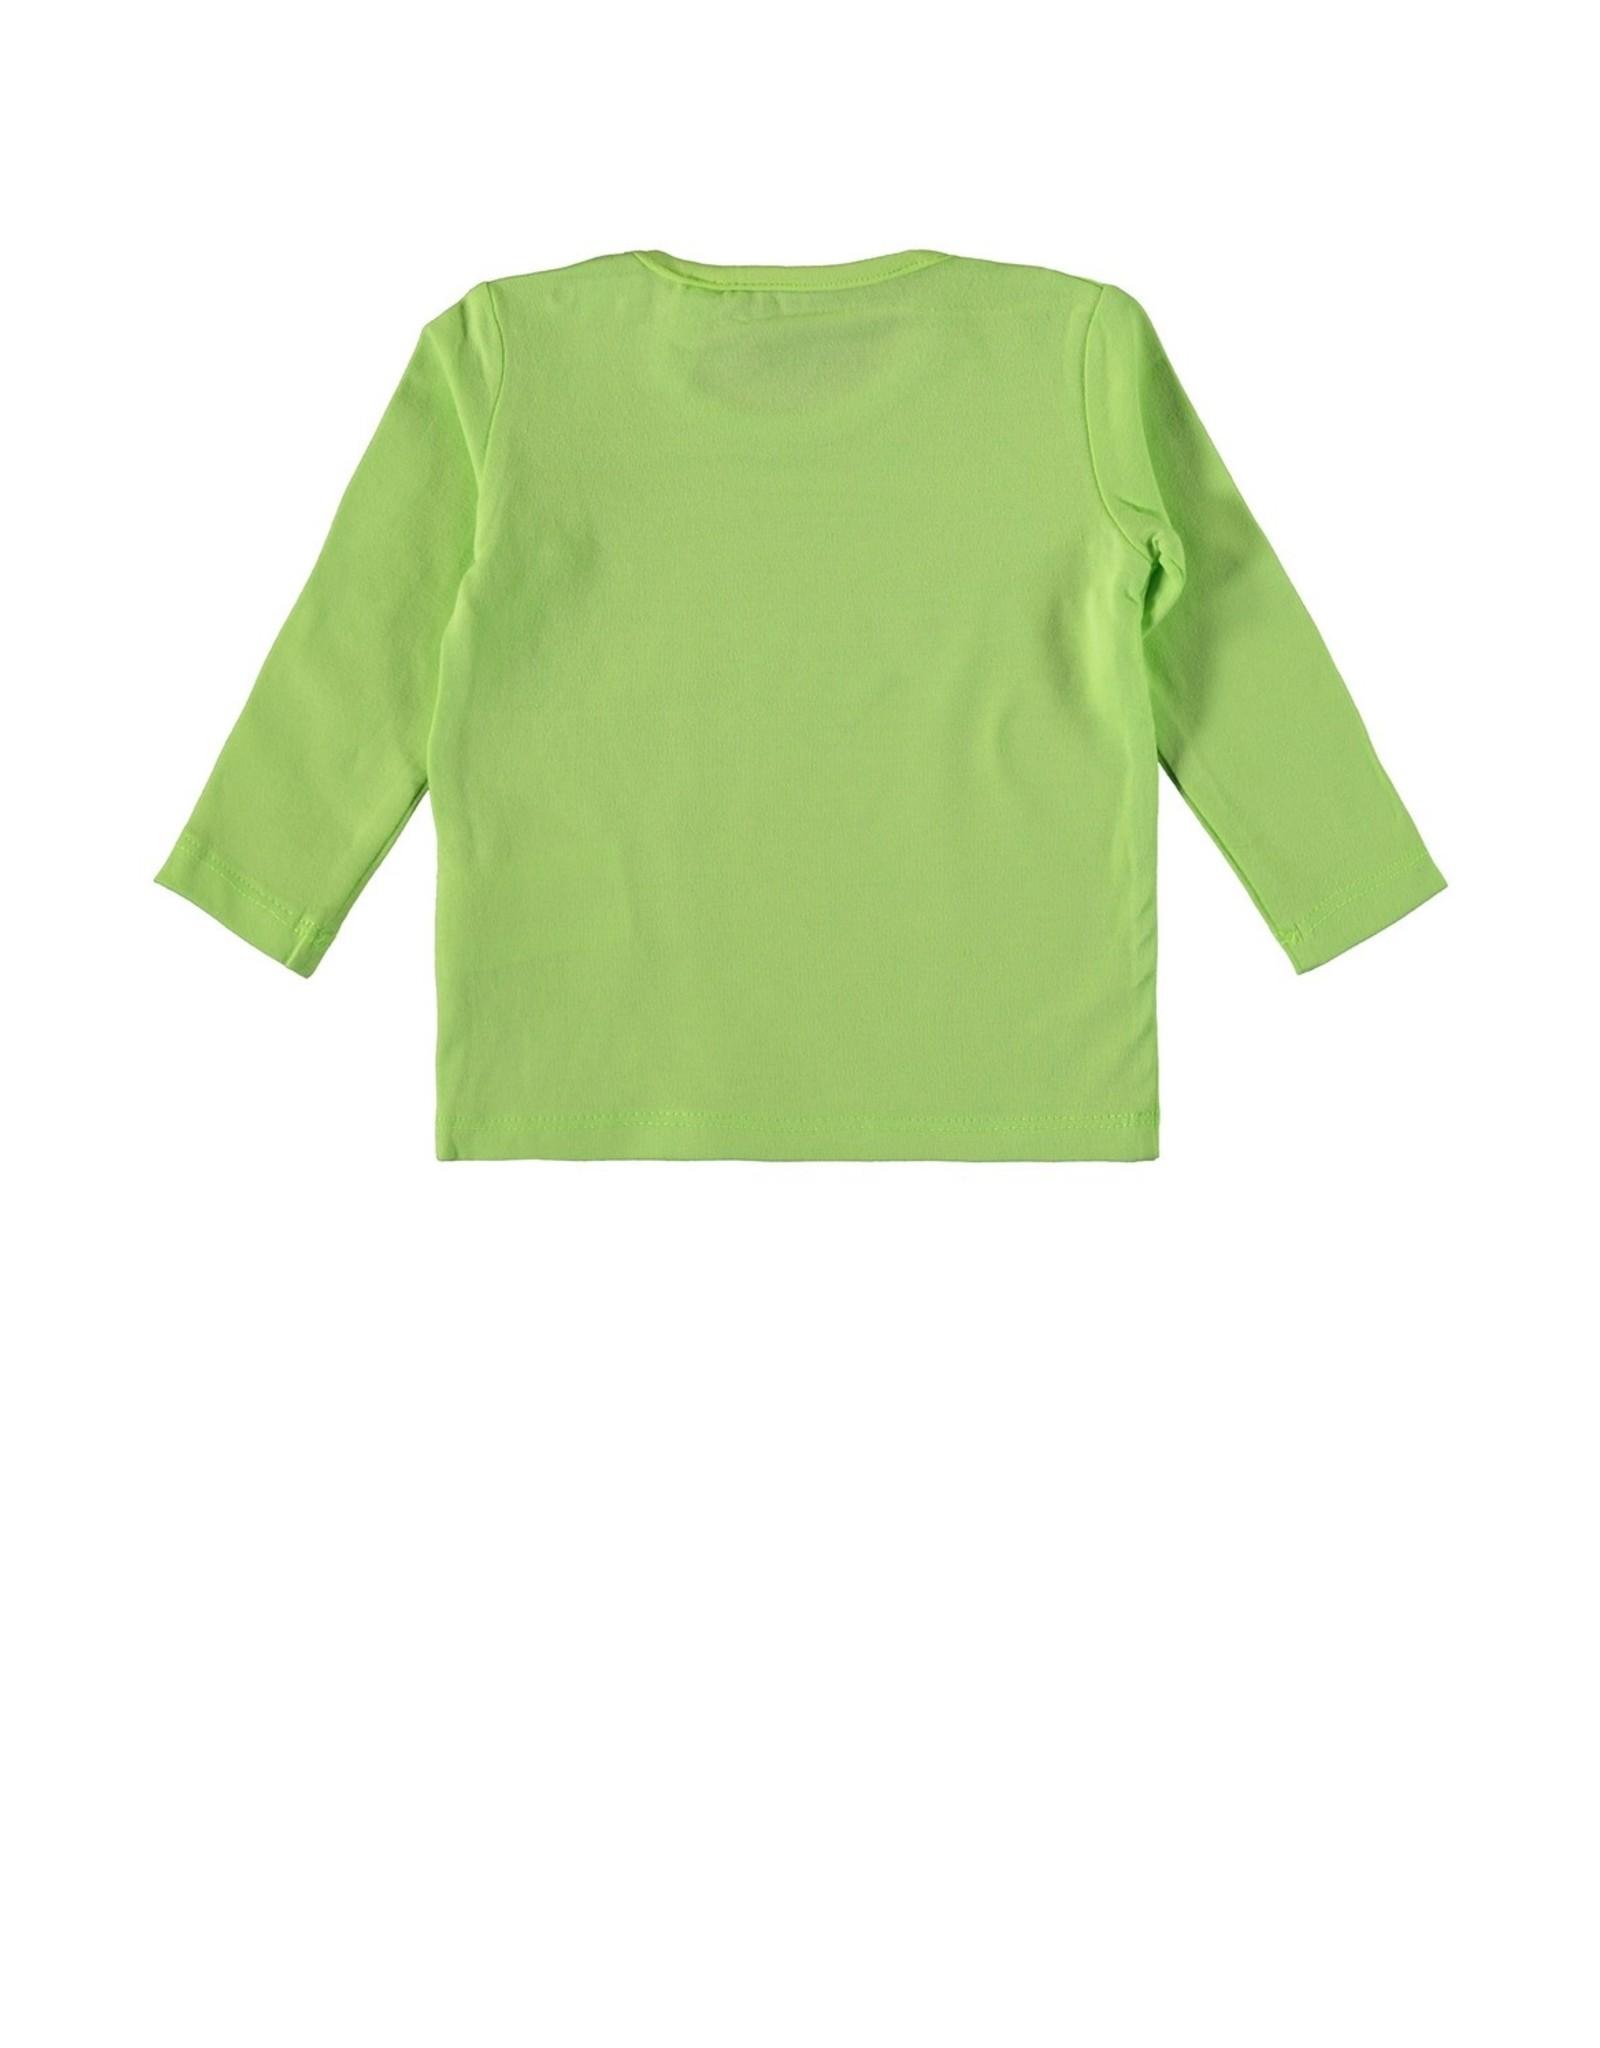 Bampidano Baby Boys T-shirt l/s plain SAFARI / GROW UP / PARTY ANIMALS, bright green